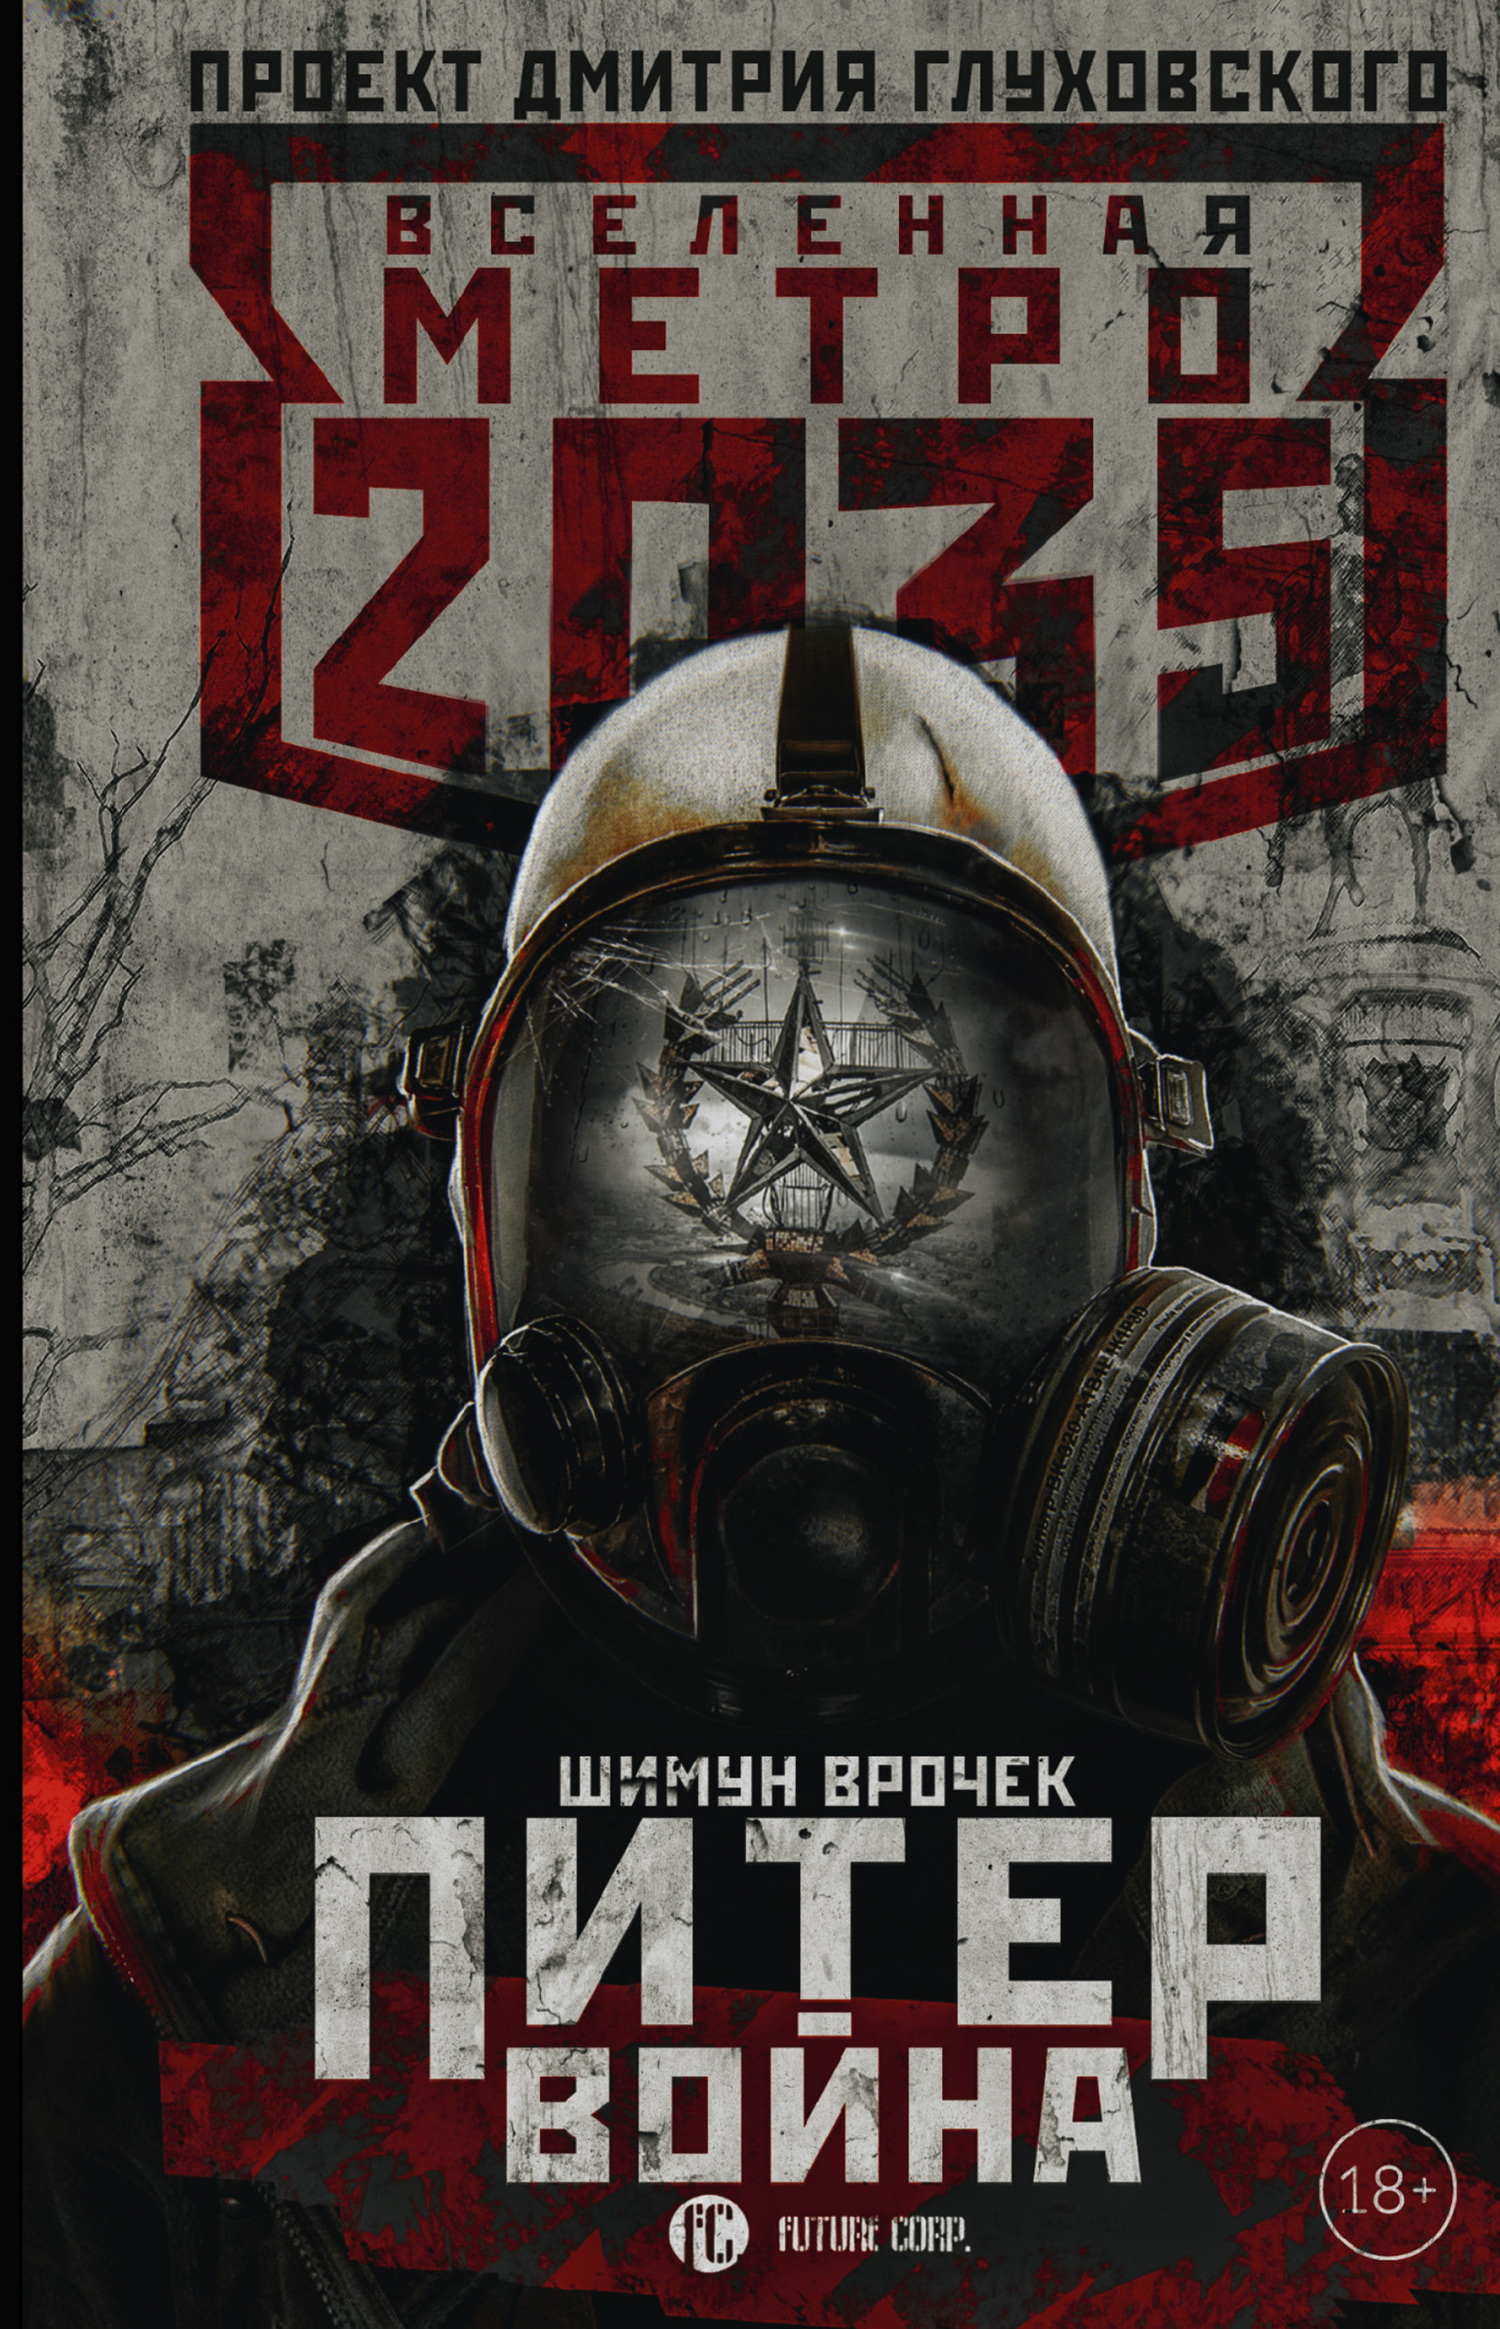 Шимун Врочек. Метро 2035: Питер. Война